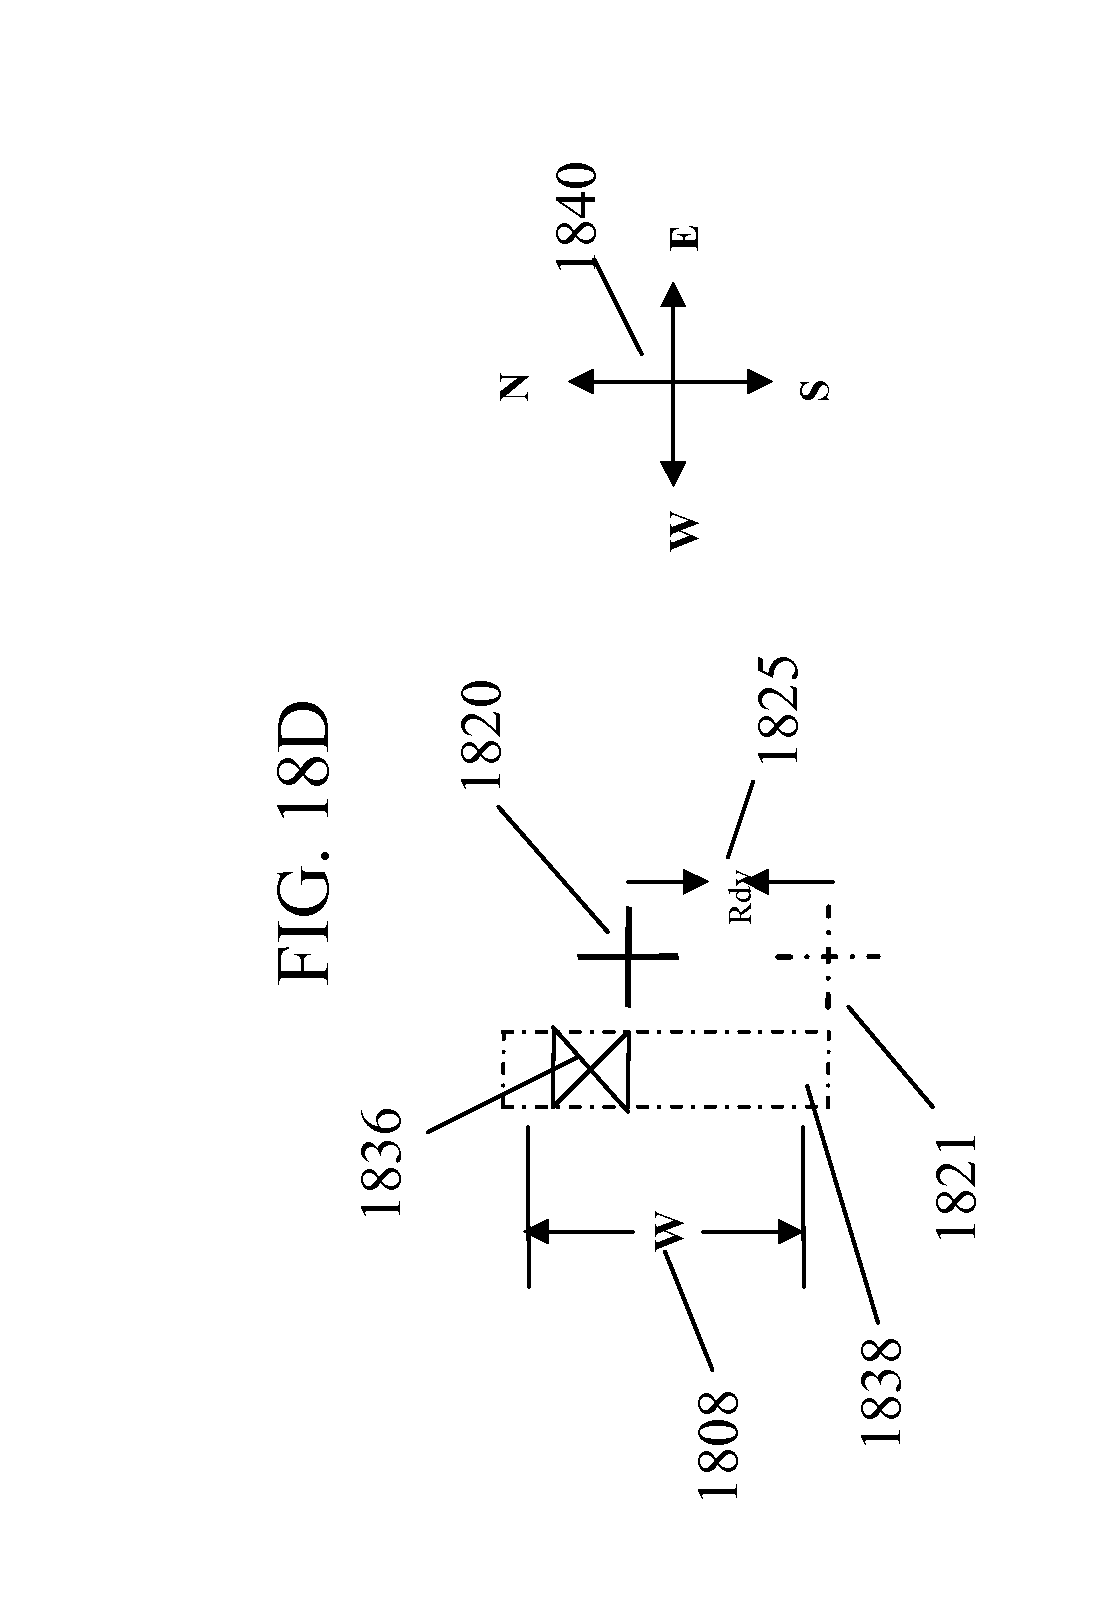 Patent Us 8362800 B2 Diodecoupled Flipflop Circuit Diagram Tradeoficcom Images